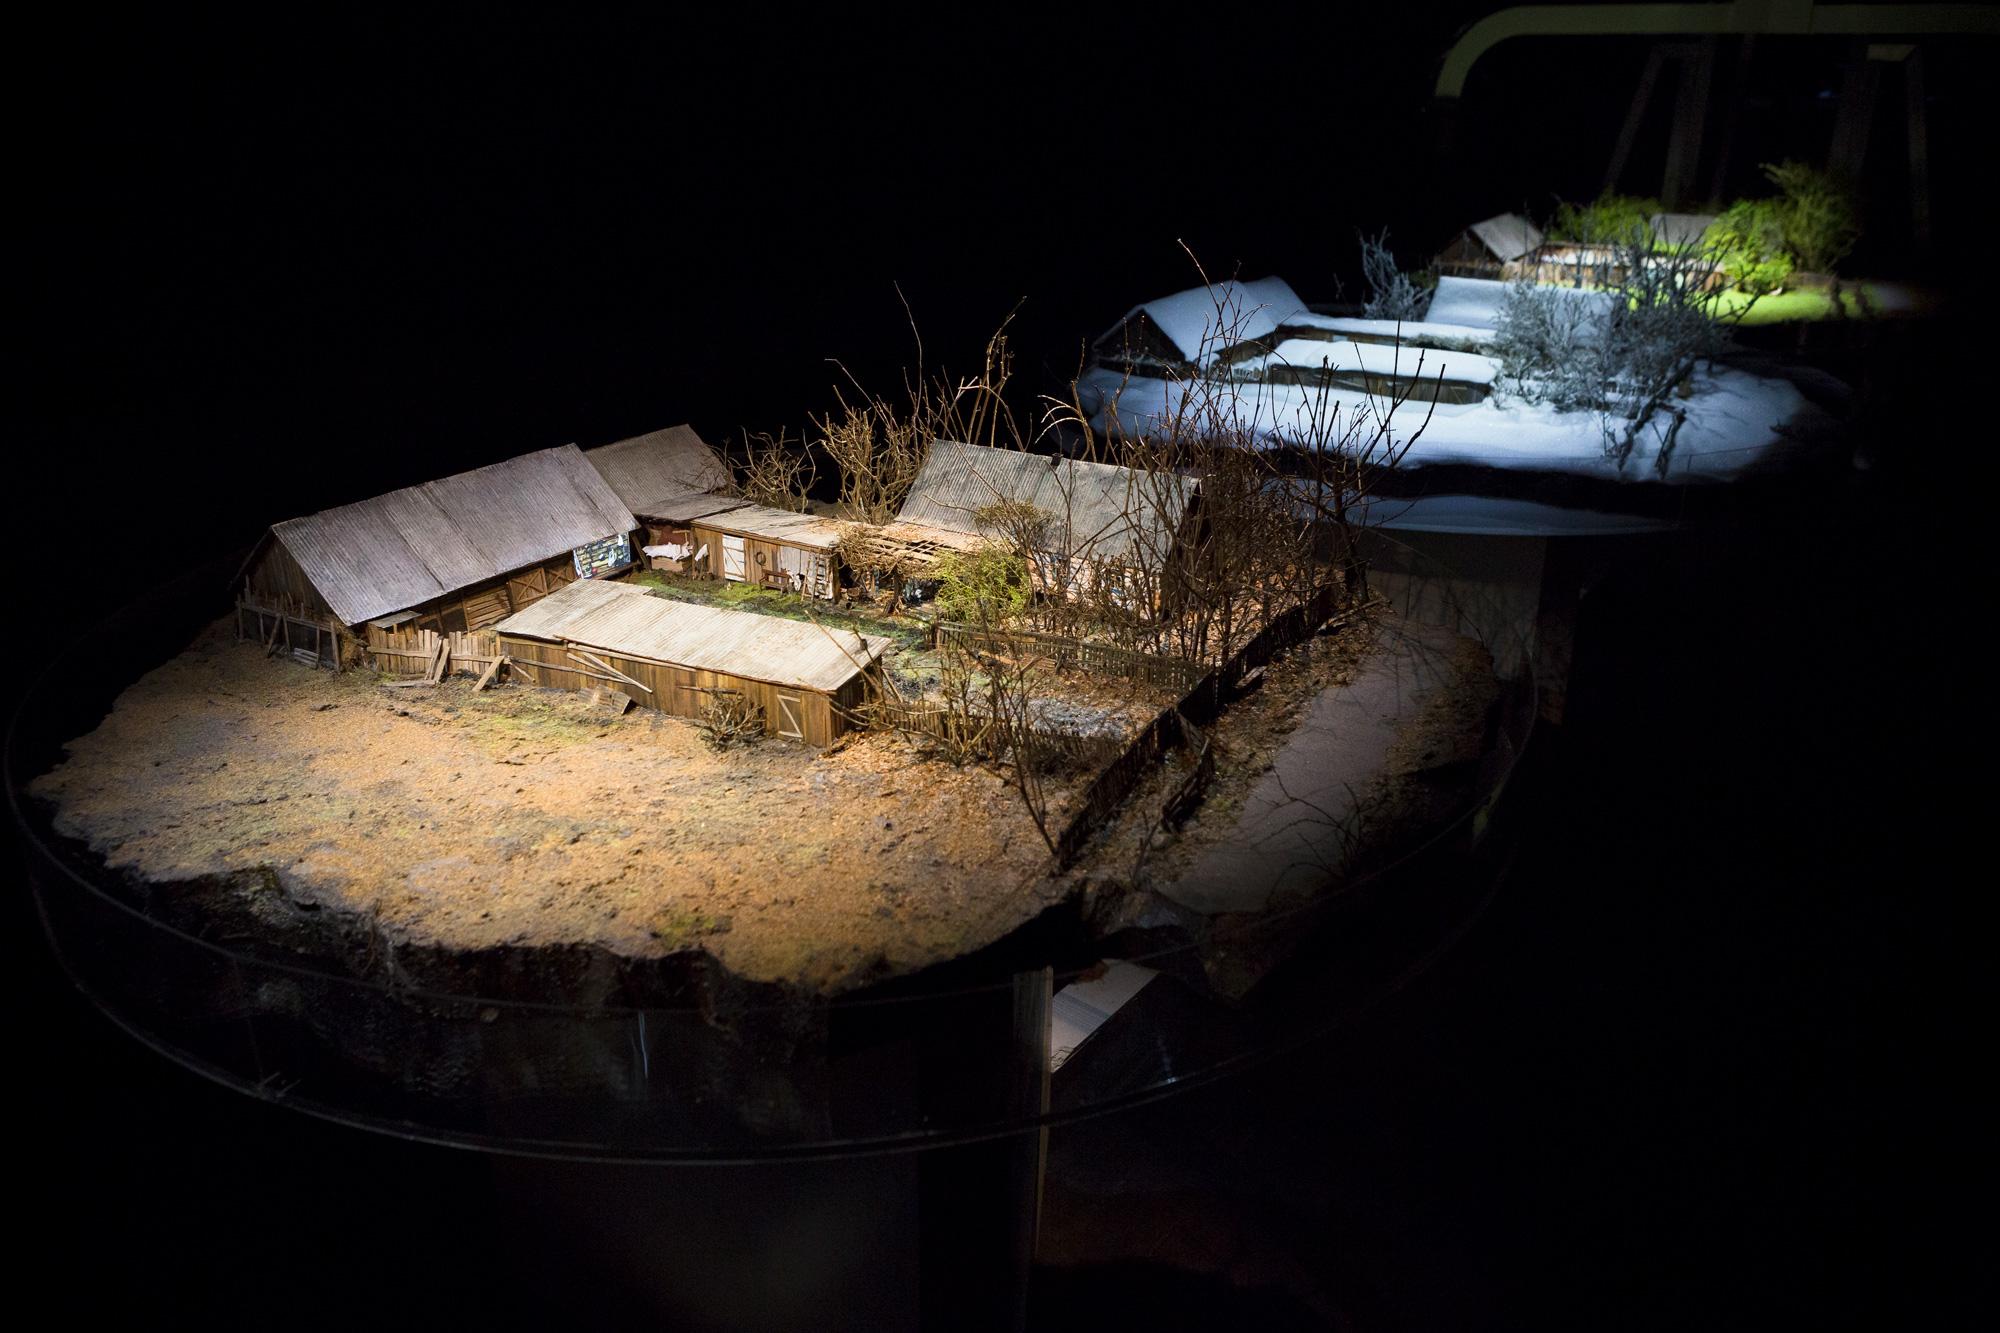 Zvizdal (Tchernobyl so far - so close) Groupe Berlin / Cathy Blisson